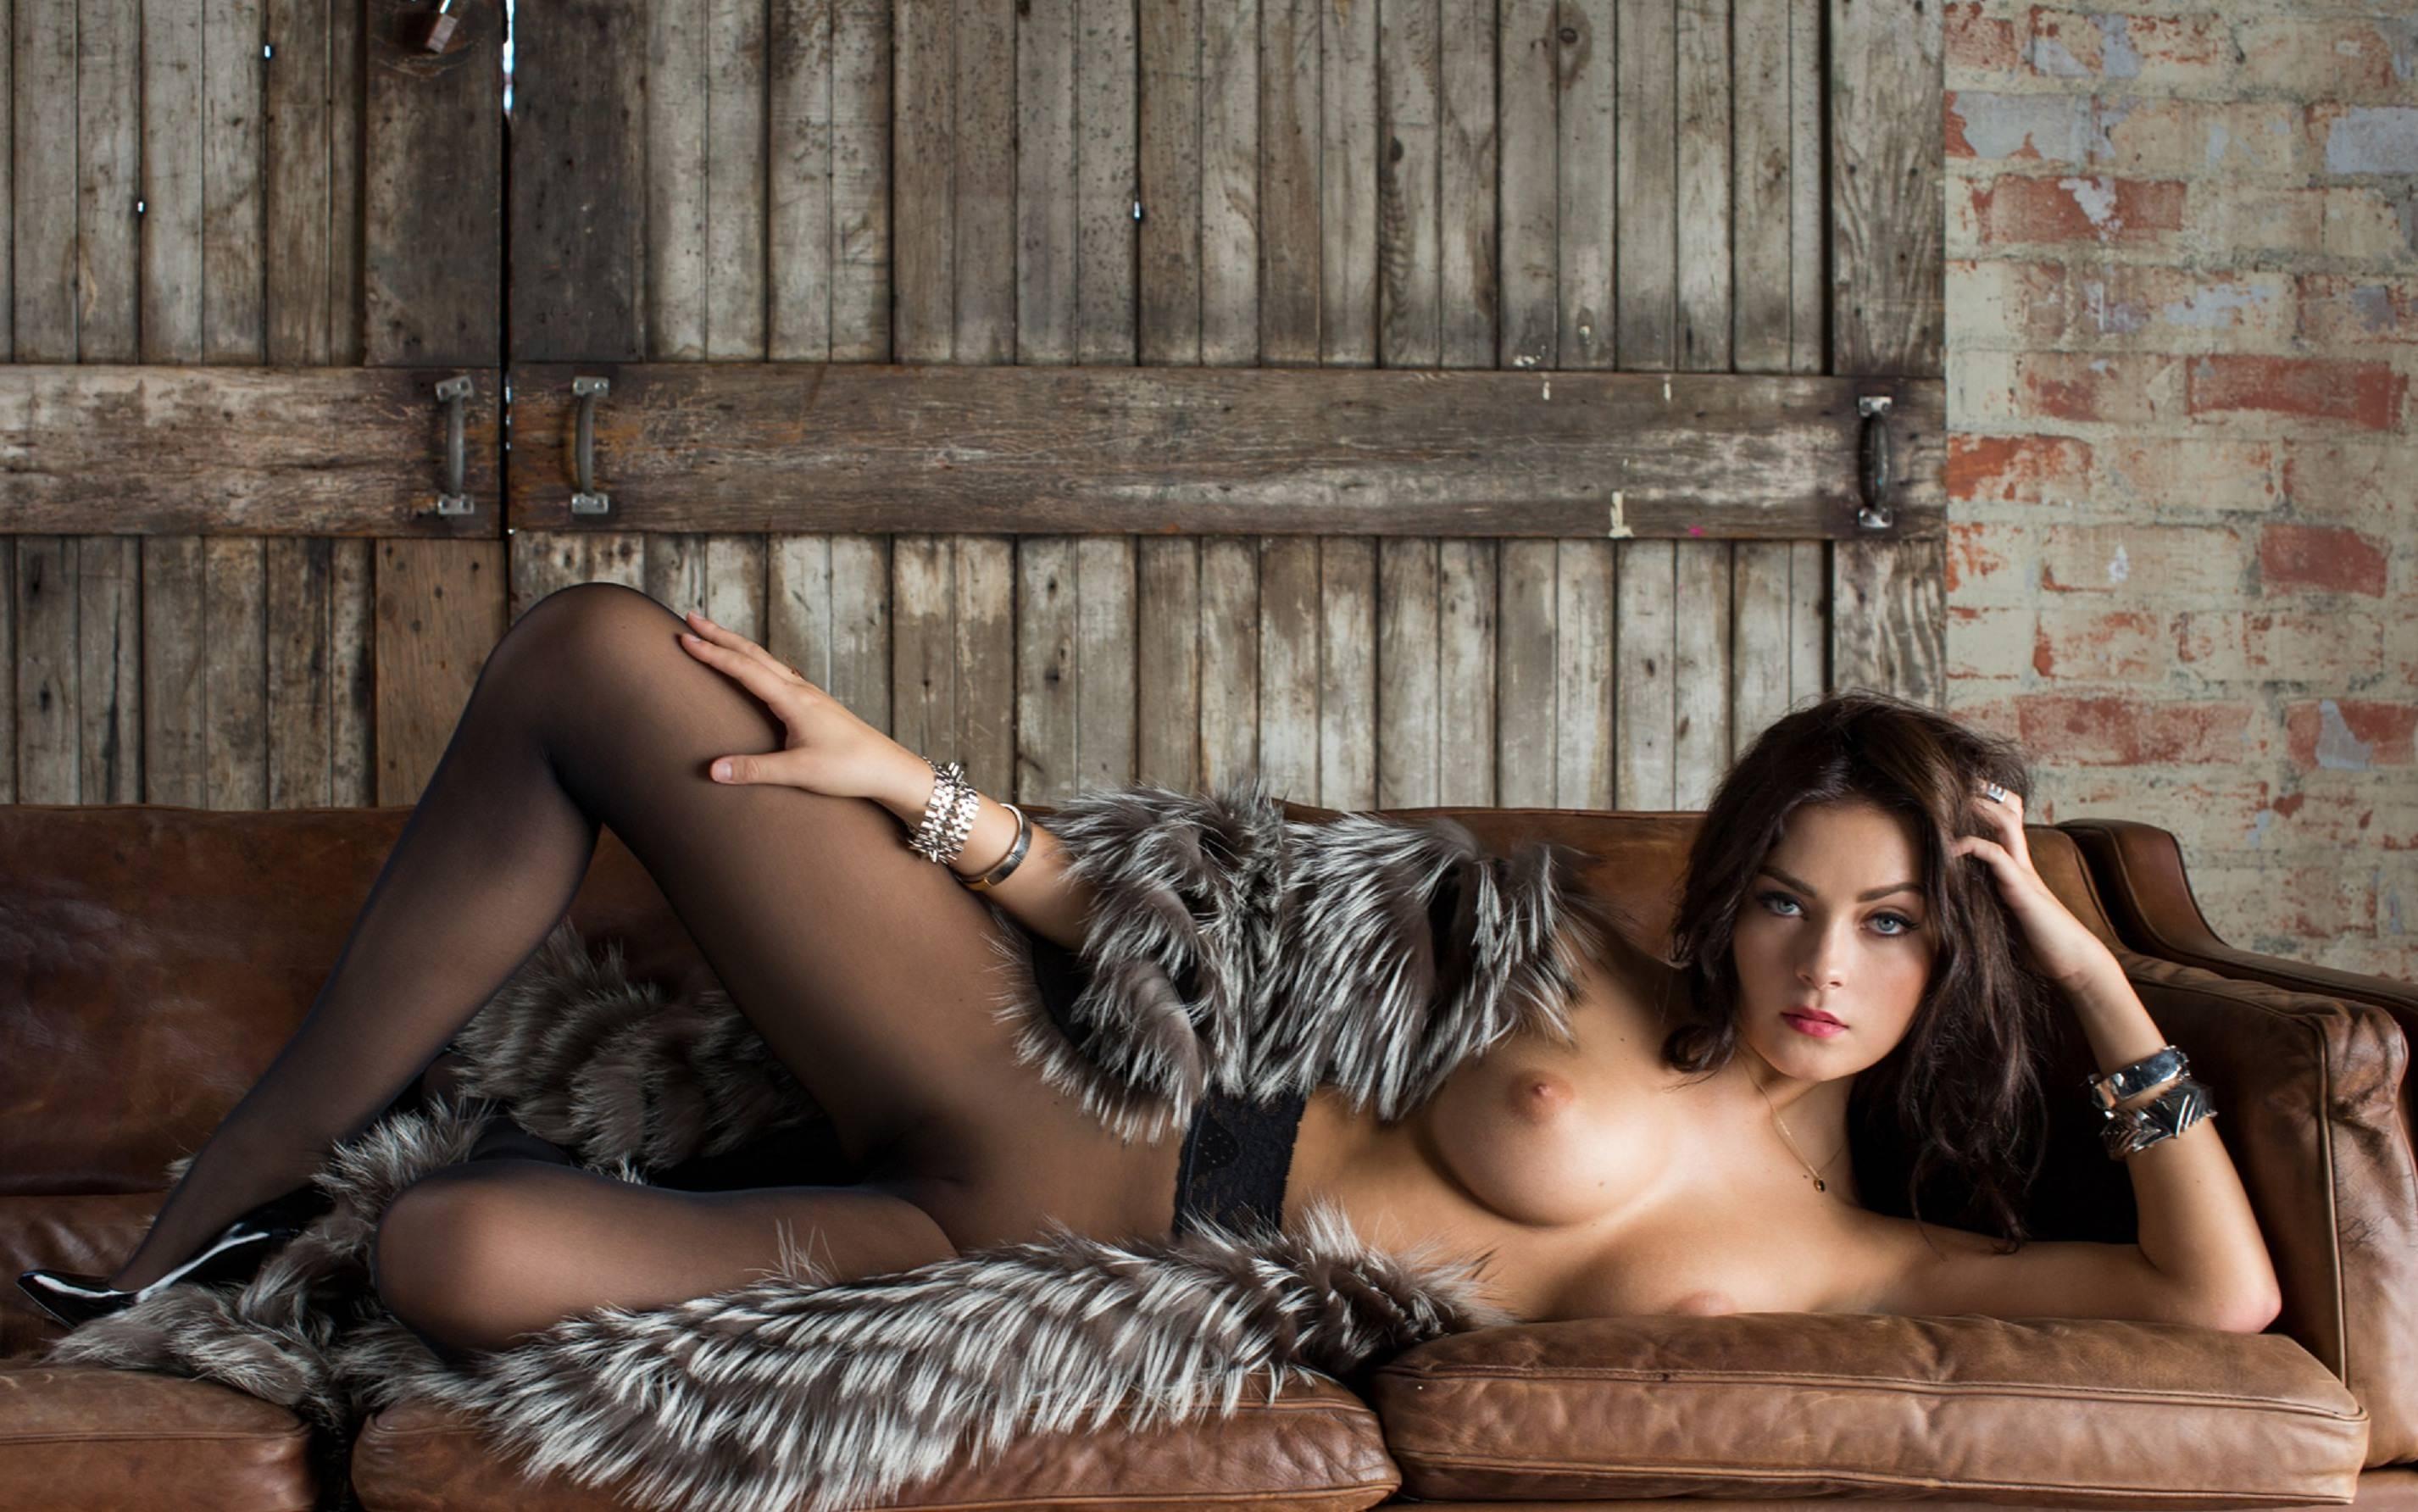 Indian girls nude playboy